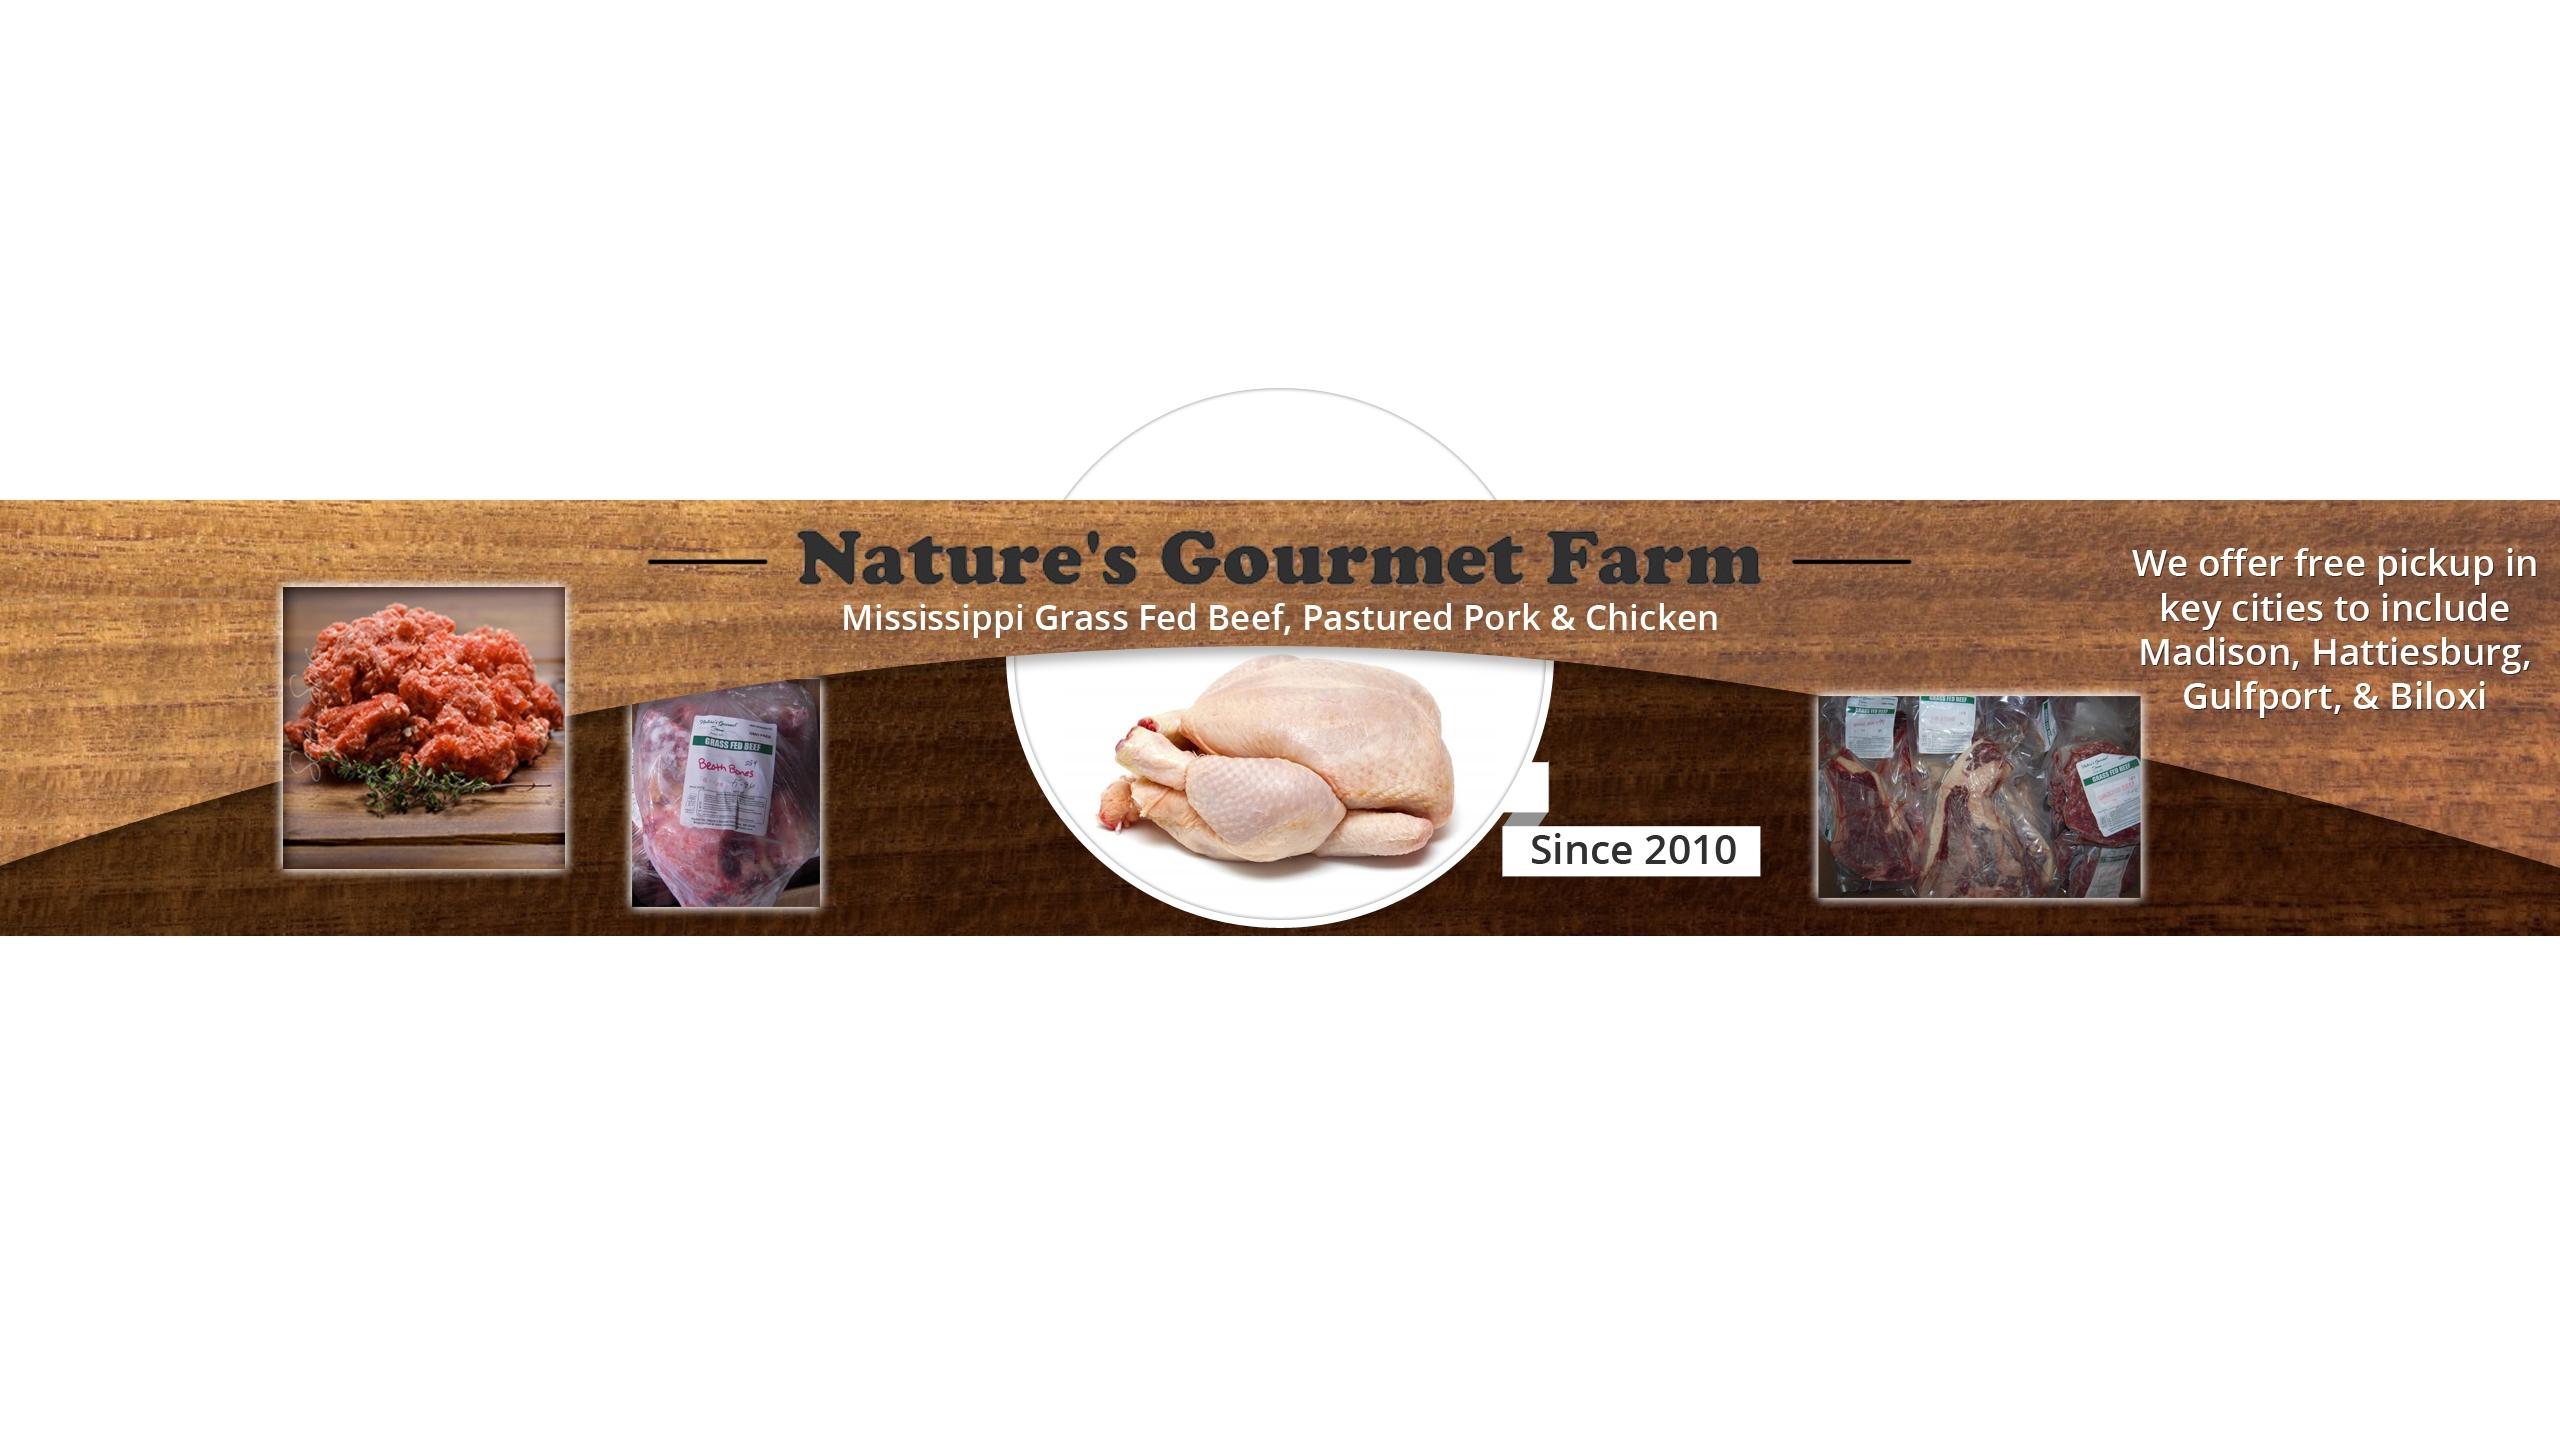 Nature's Gourmet Farm (@naturesgourmetfarm) Cover Image